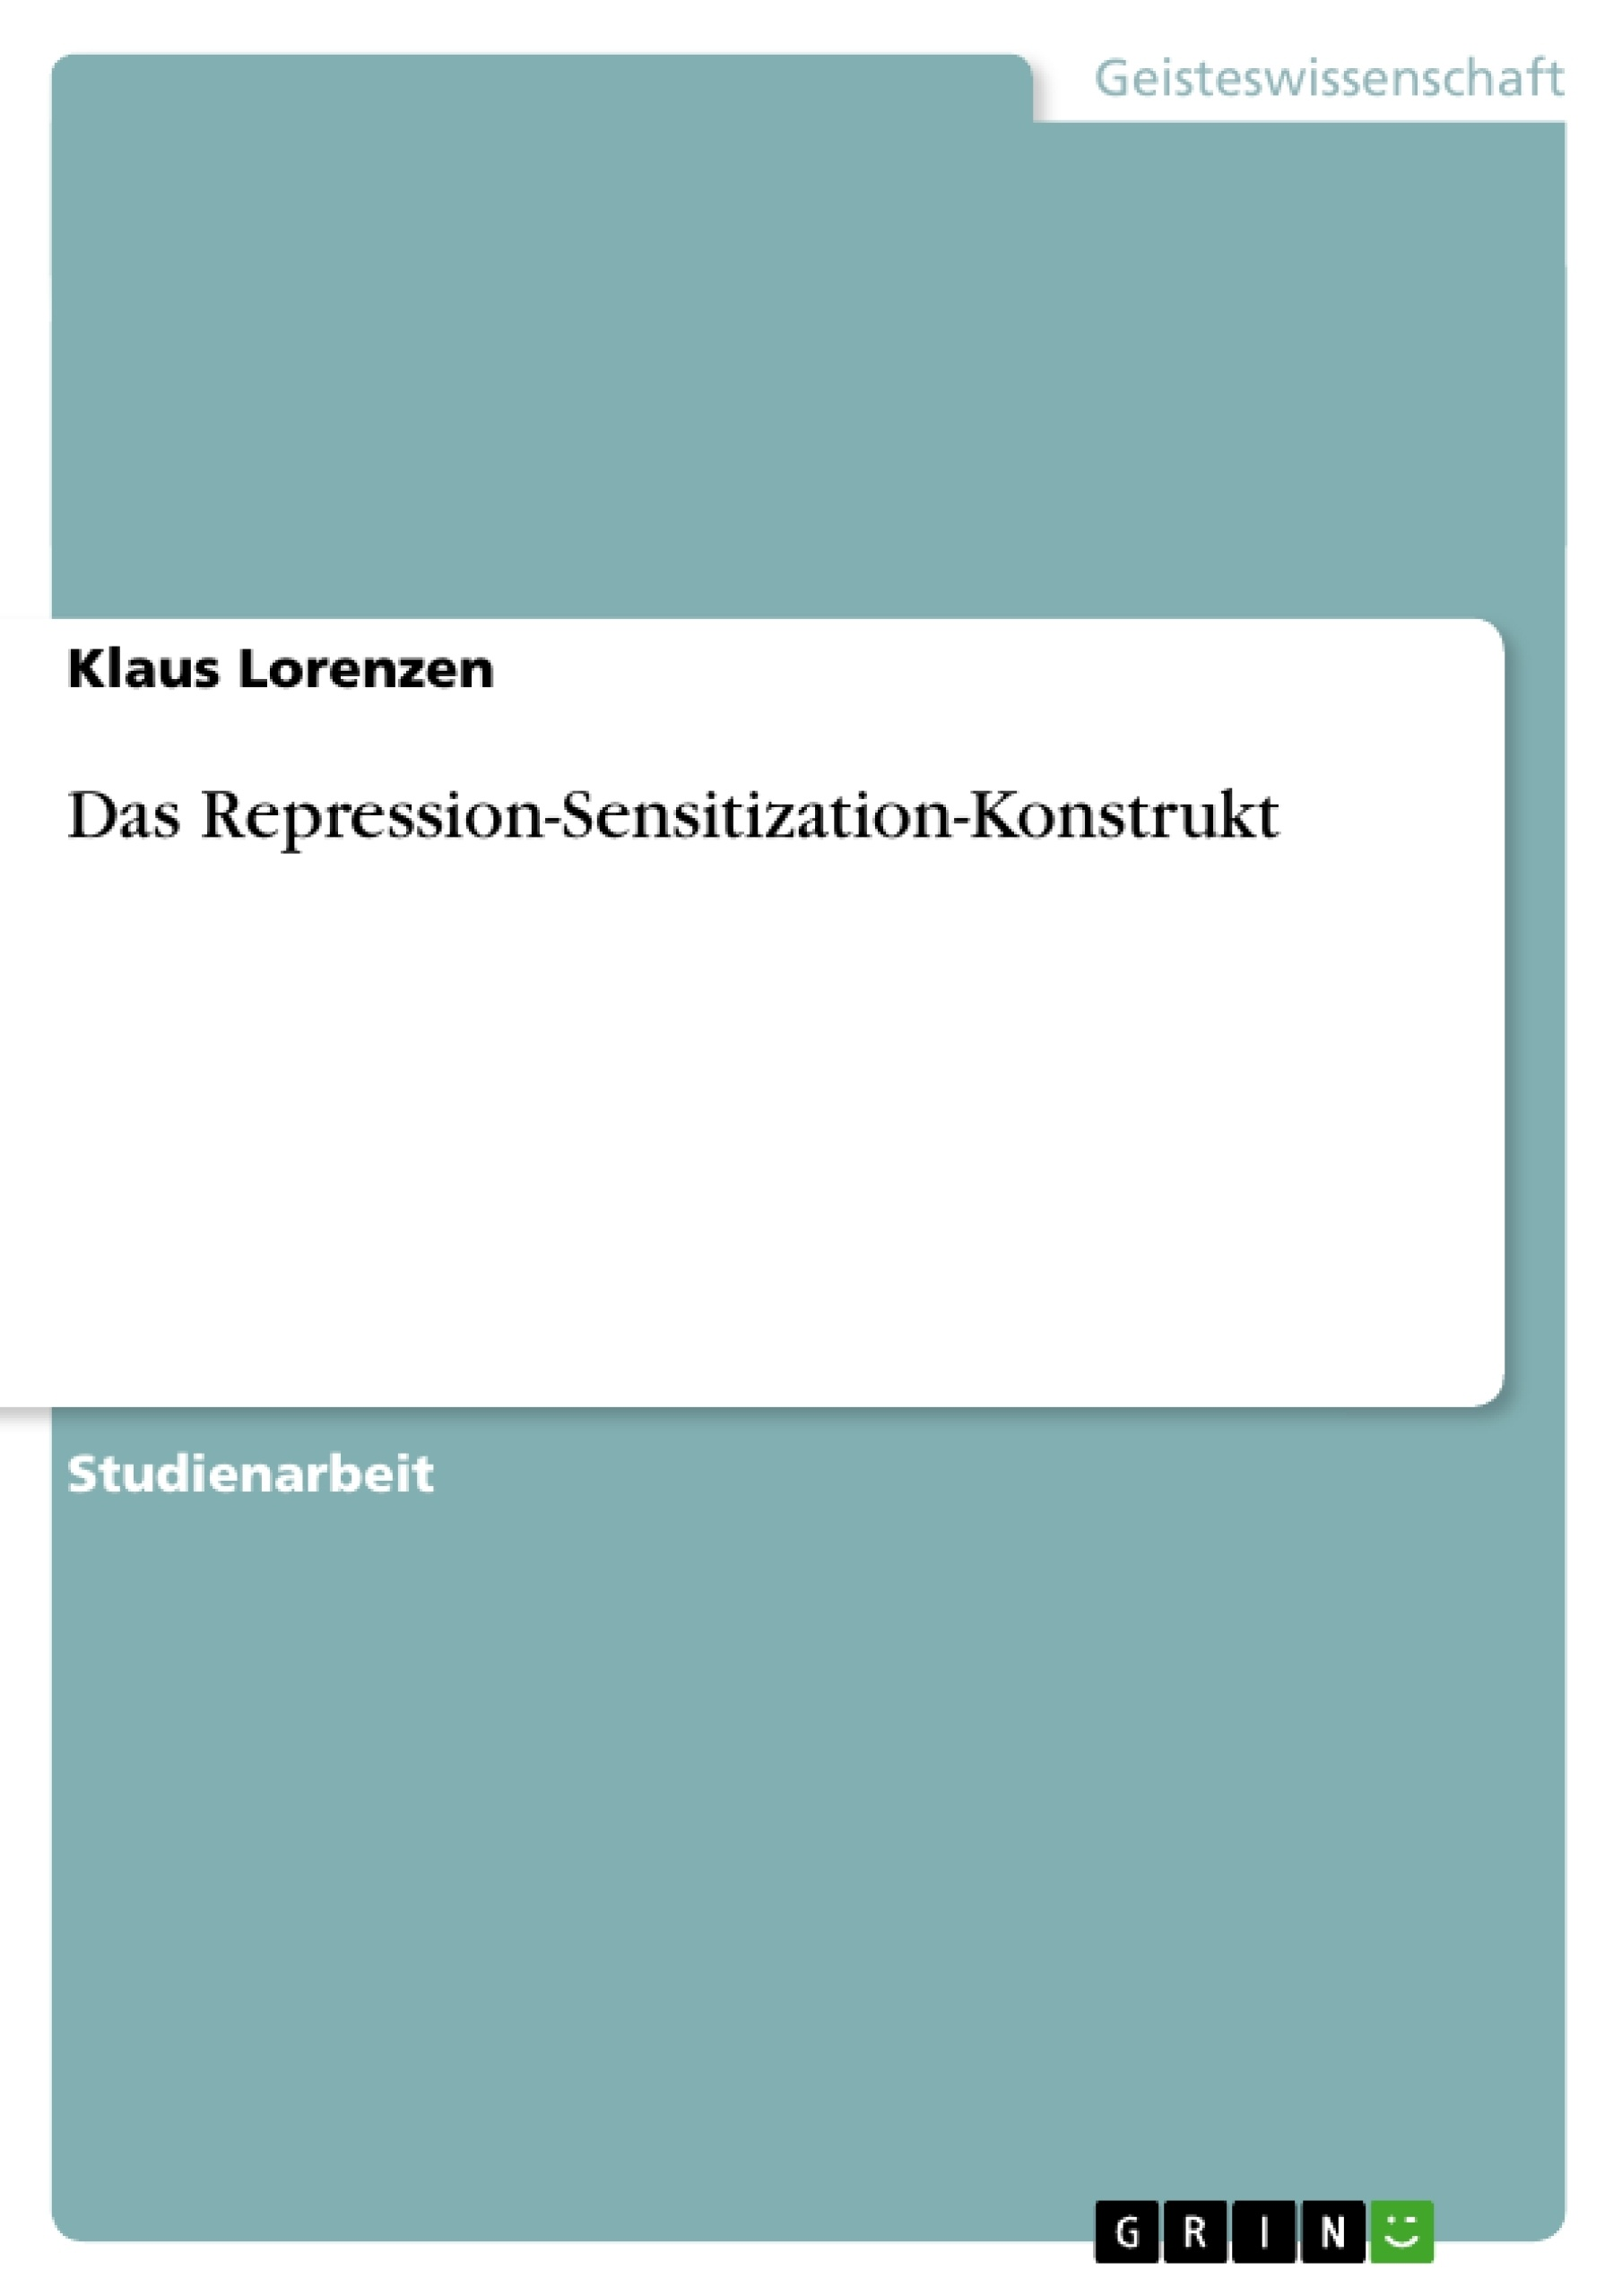 Titel: Das Repression-Sensitization-Konstrukt